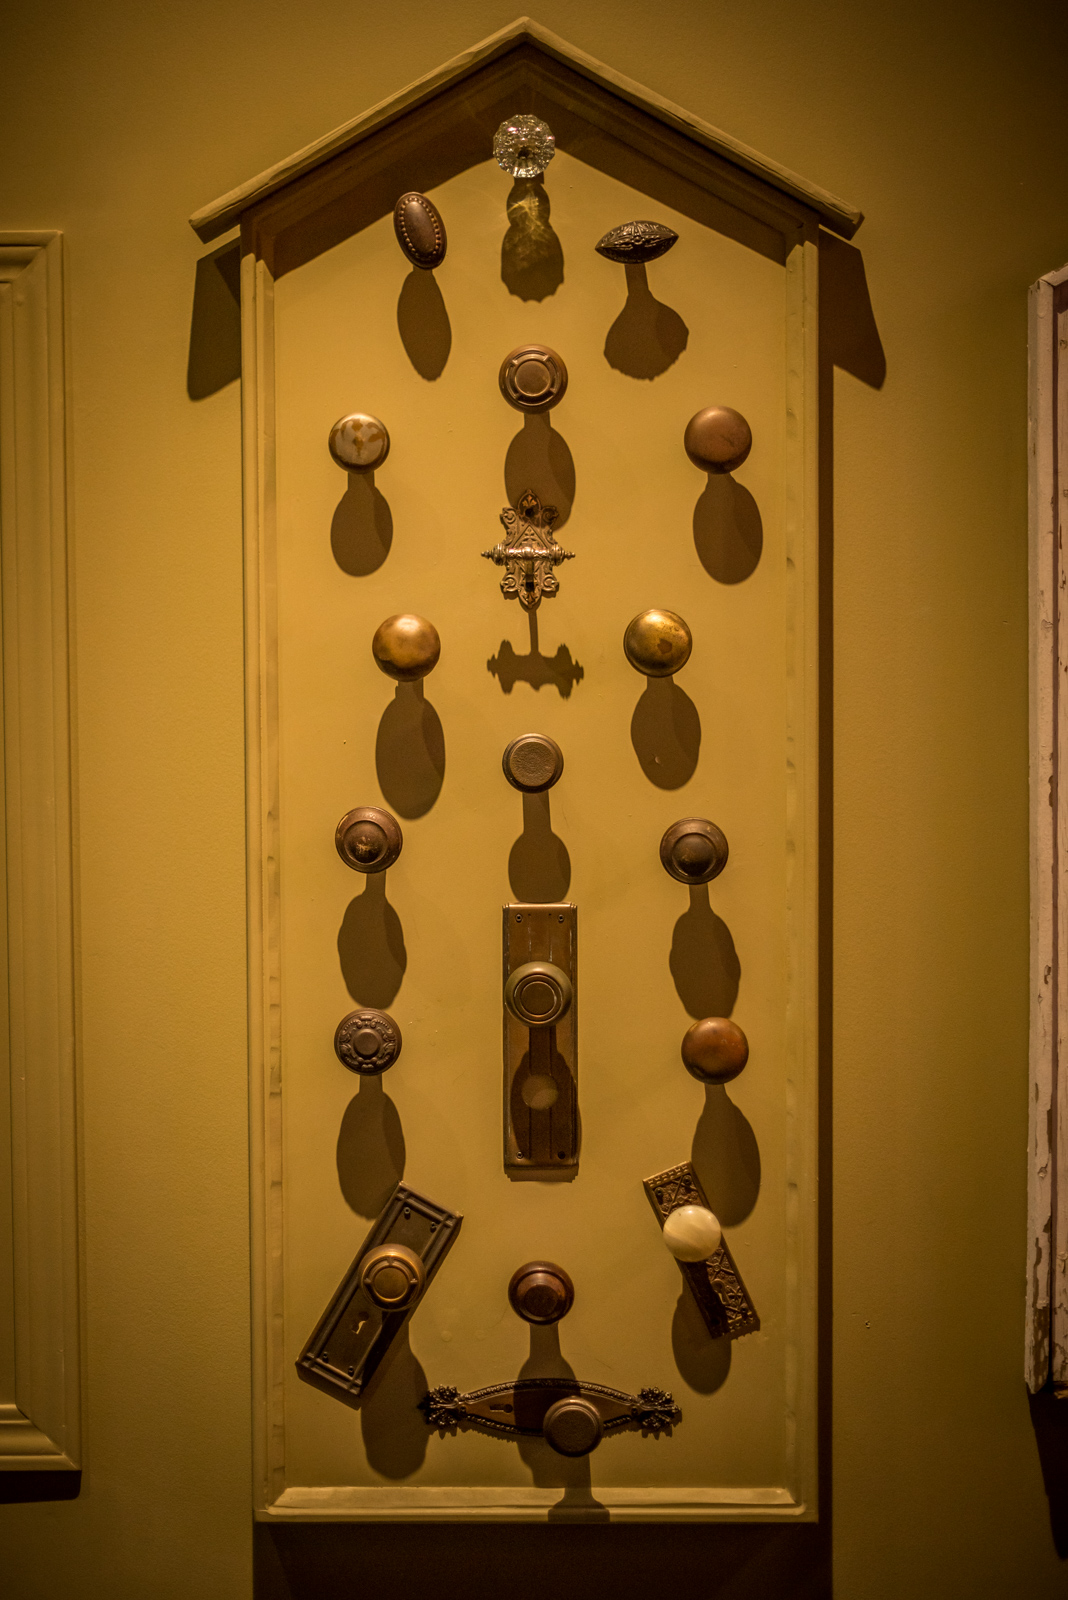 A display of vintage doorknobs in the 'Surrey Stories Gallery'